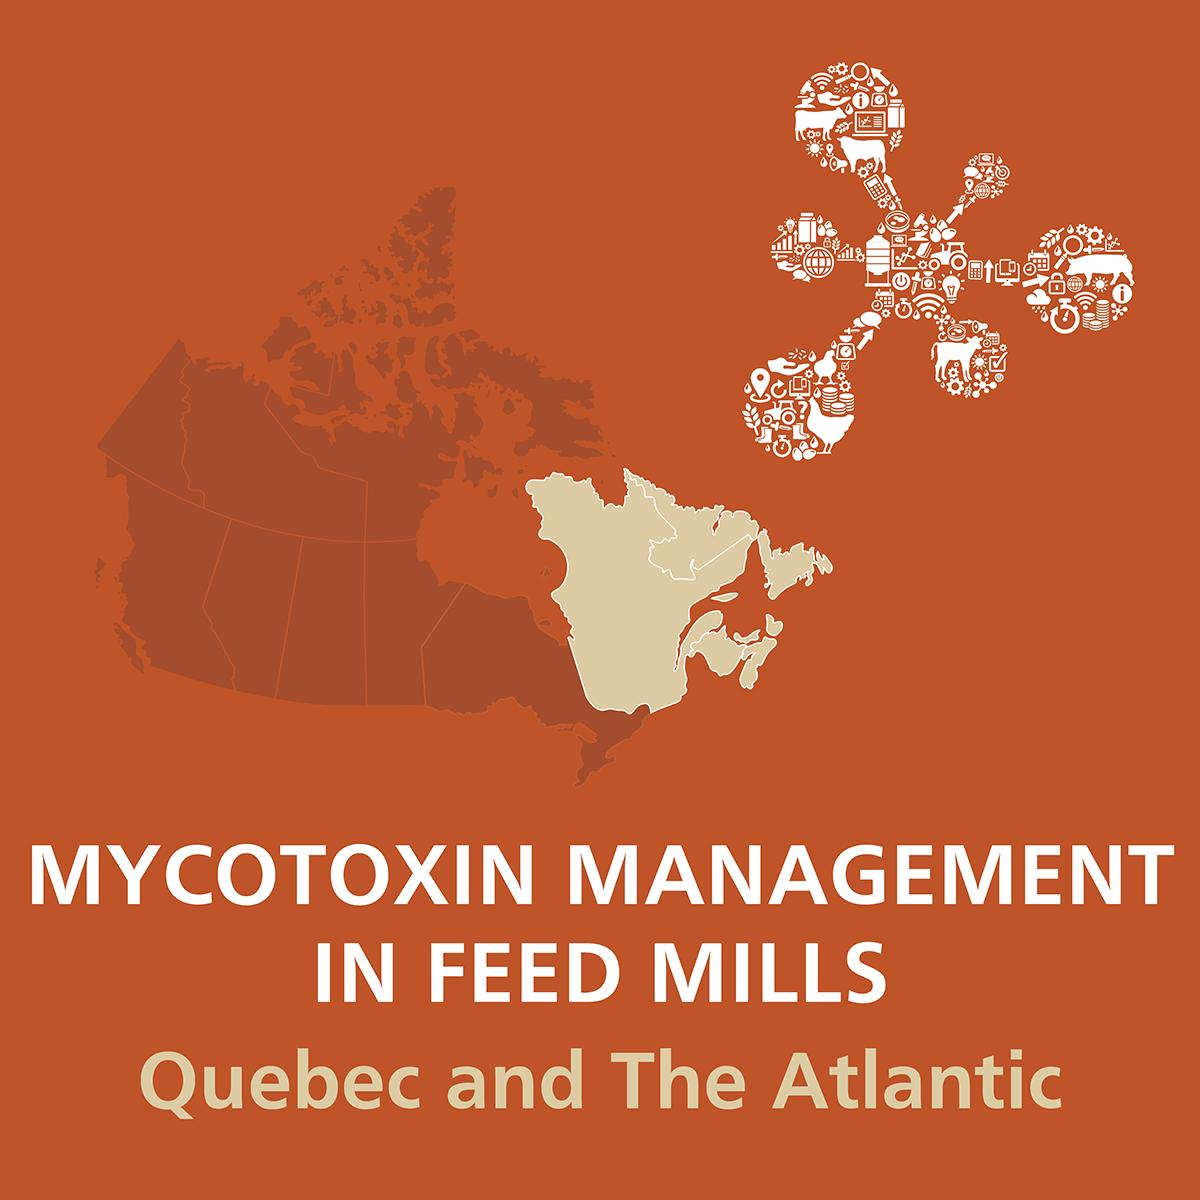 MycotoxinManagementFeedMills_QA